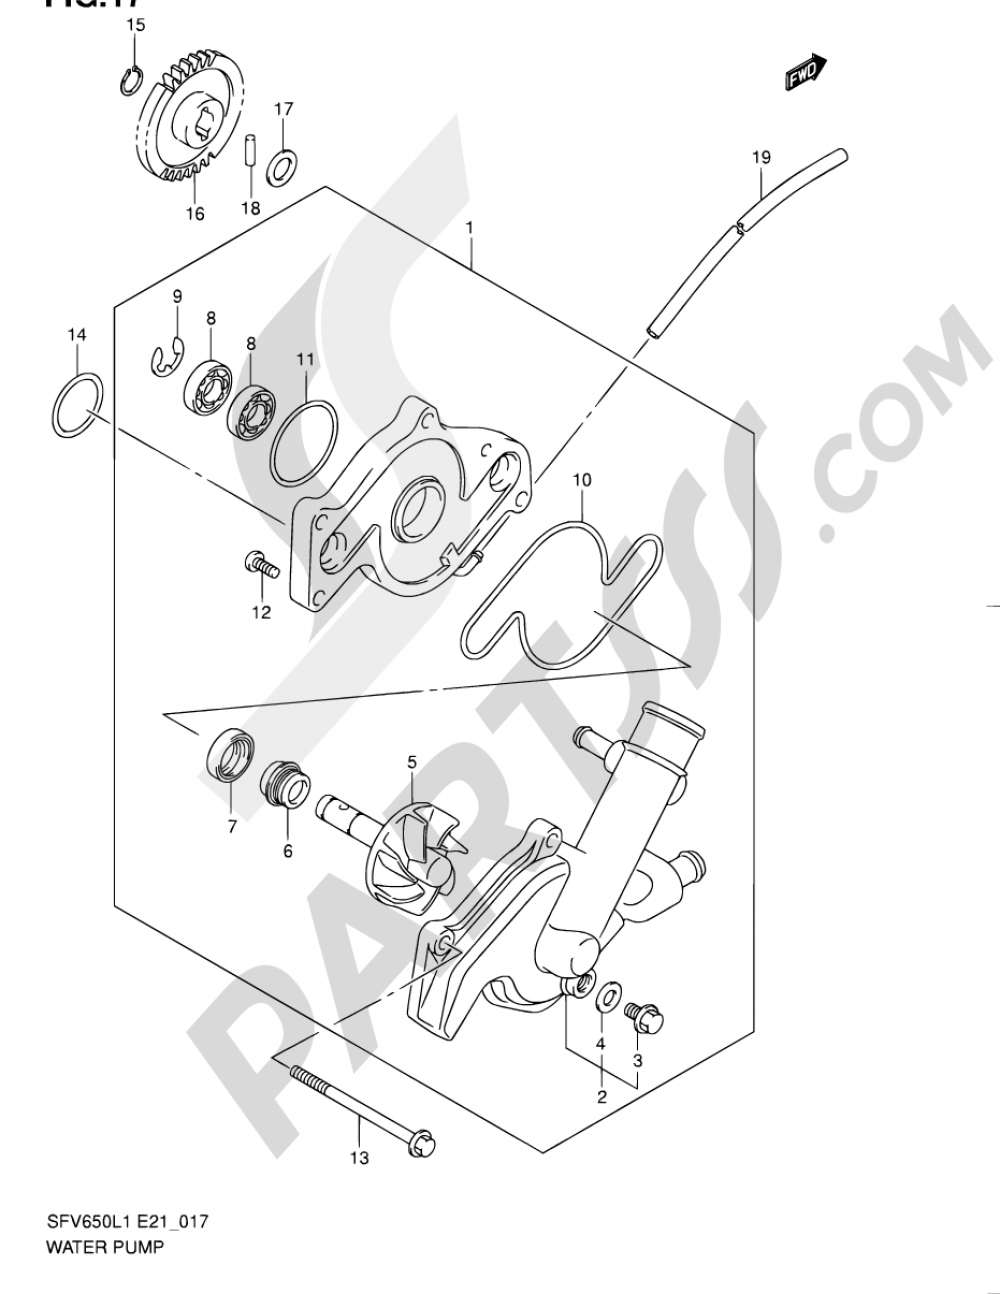 17 - WATER PUMP Suzuki GLADIUS SFV650A 2011